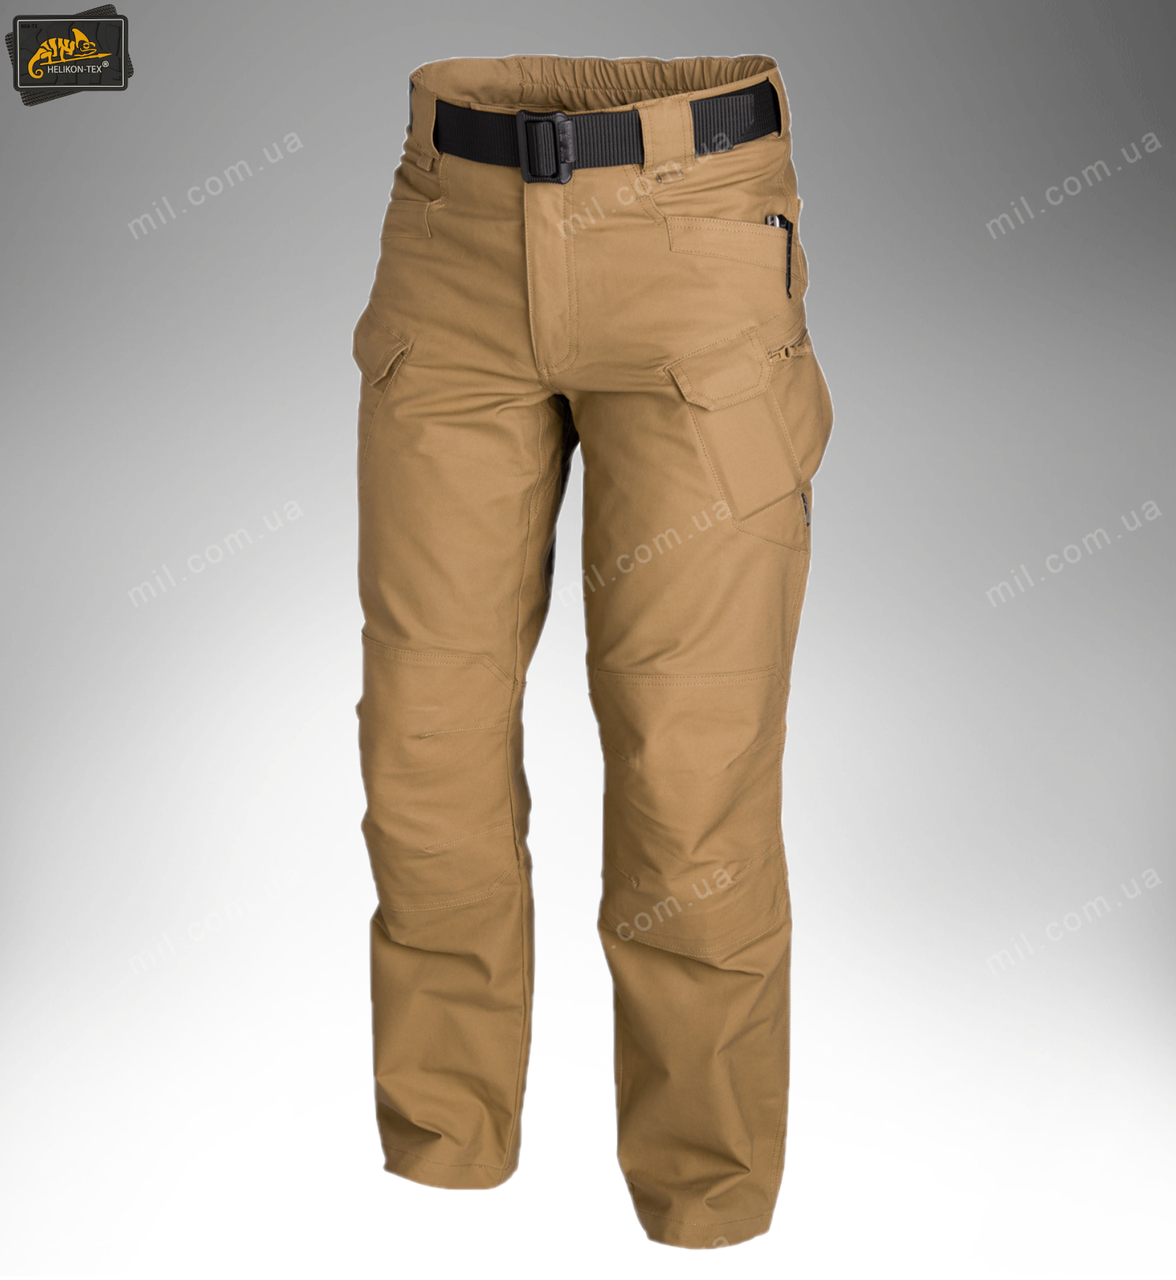 Тактичні брюки / штани Helikon Tex UTP Urban Tactical Pants (коричневий)